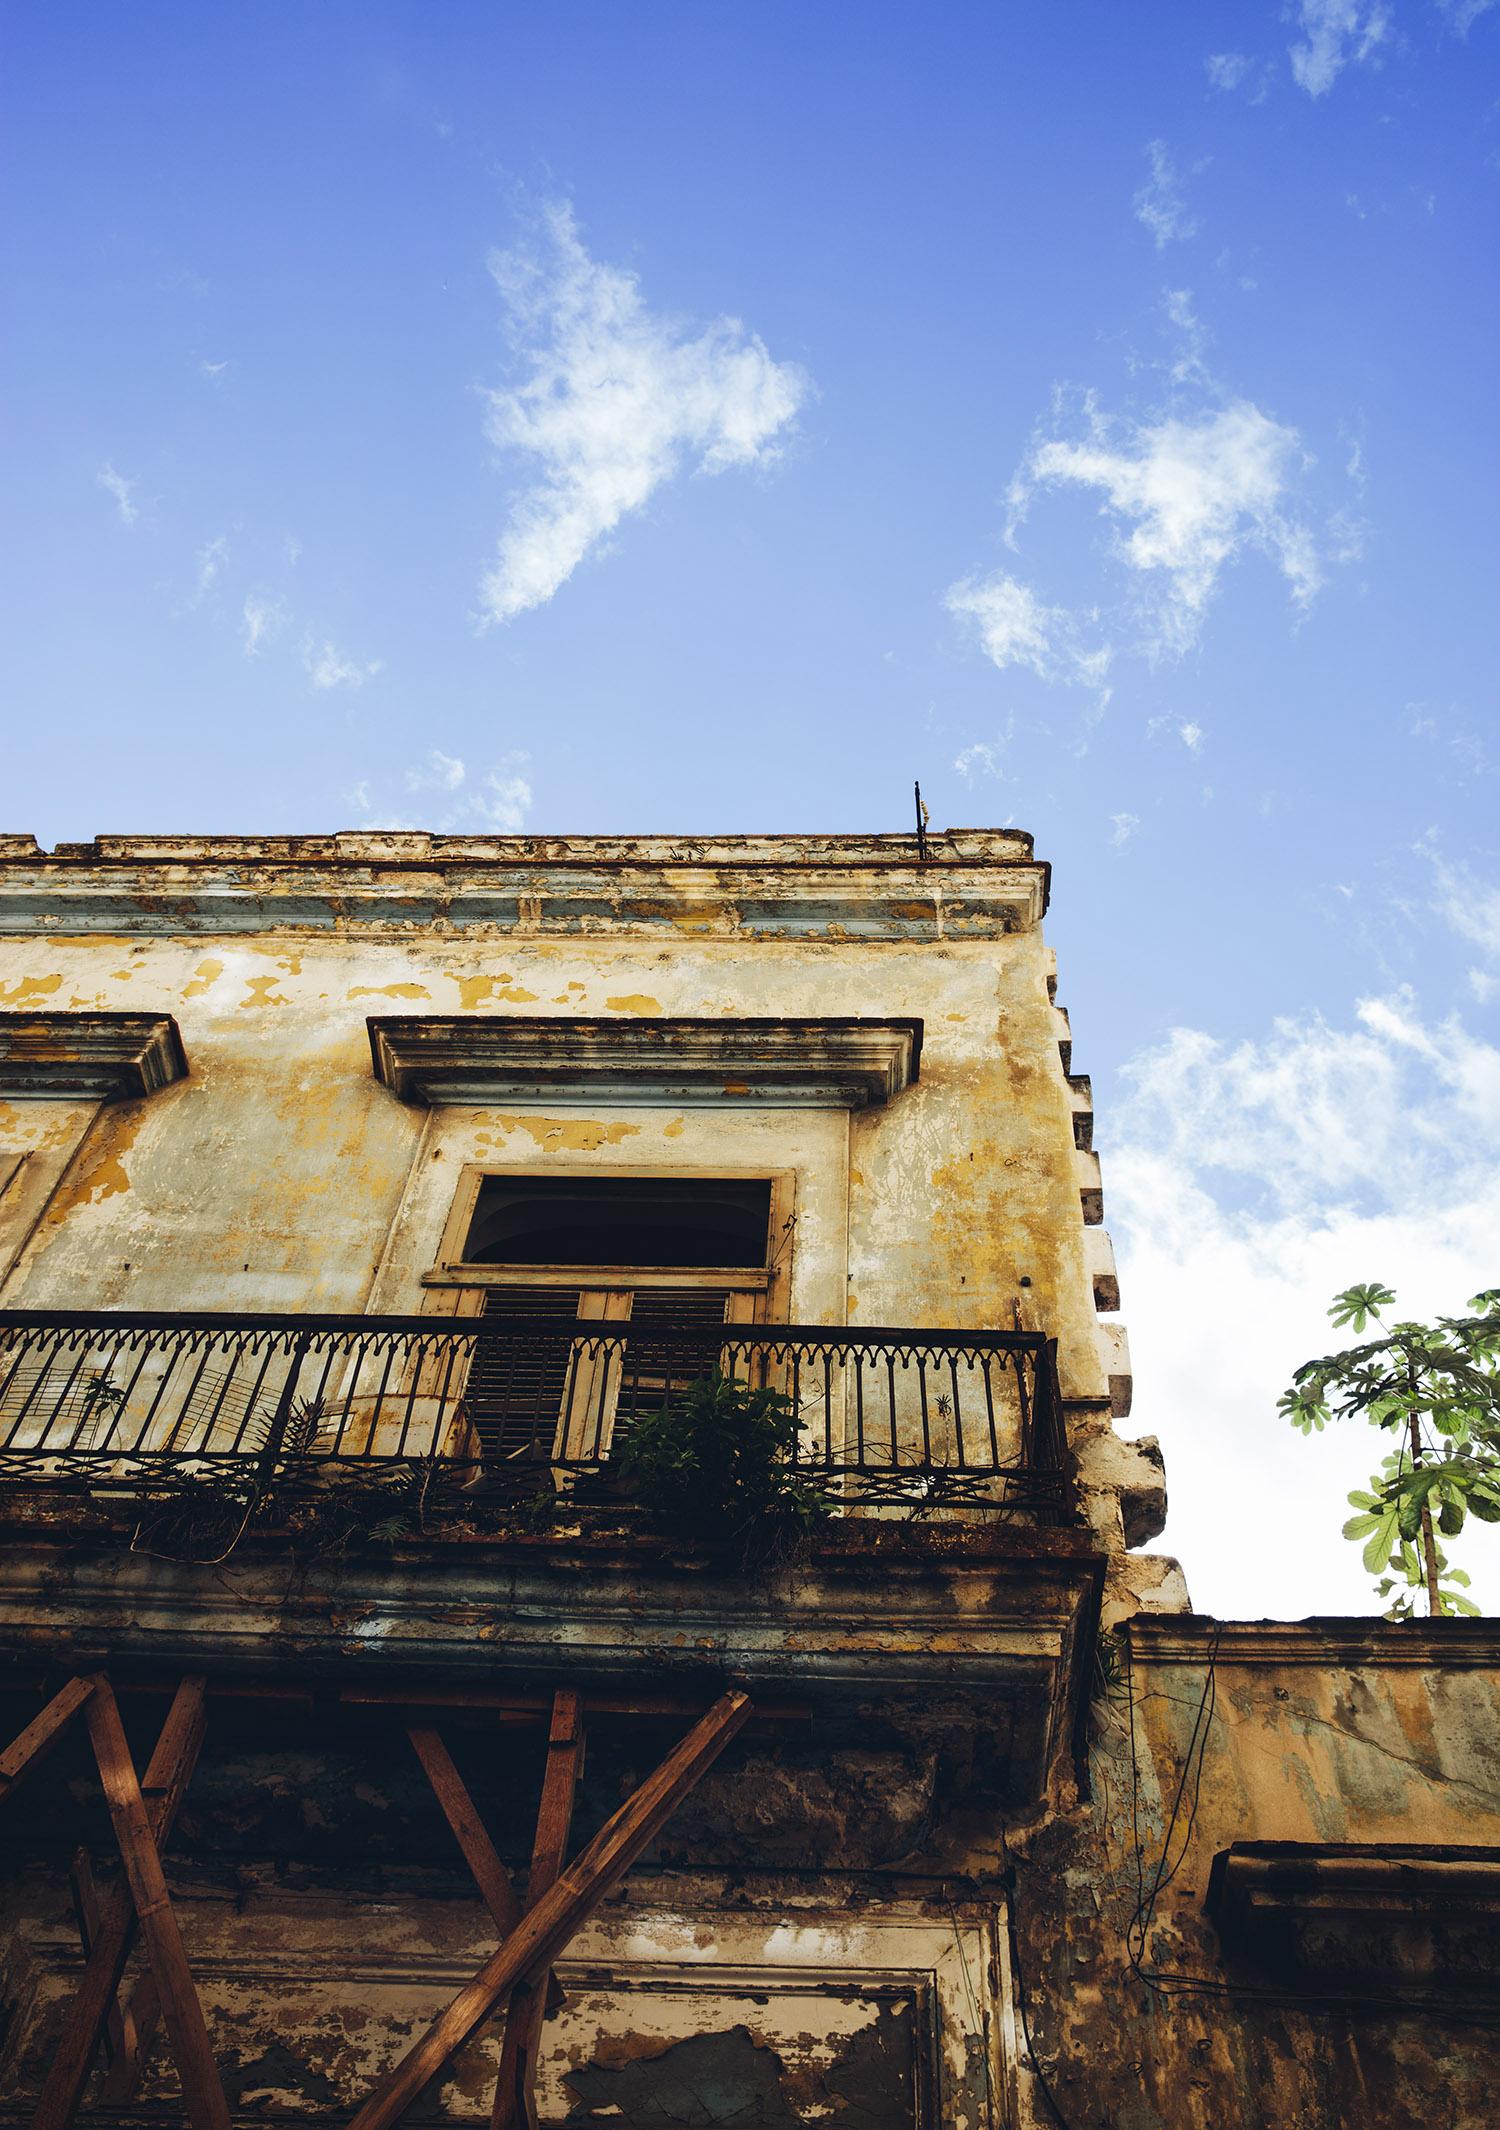 030_Cuba_-8876_final.jpg